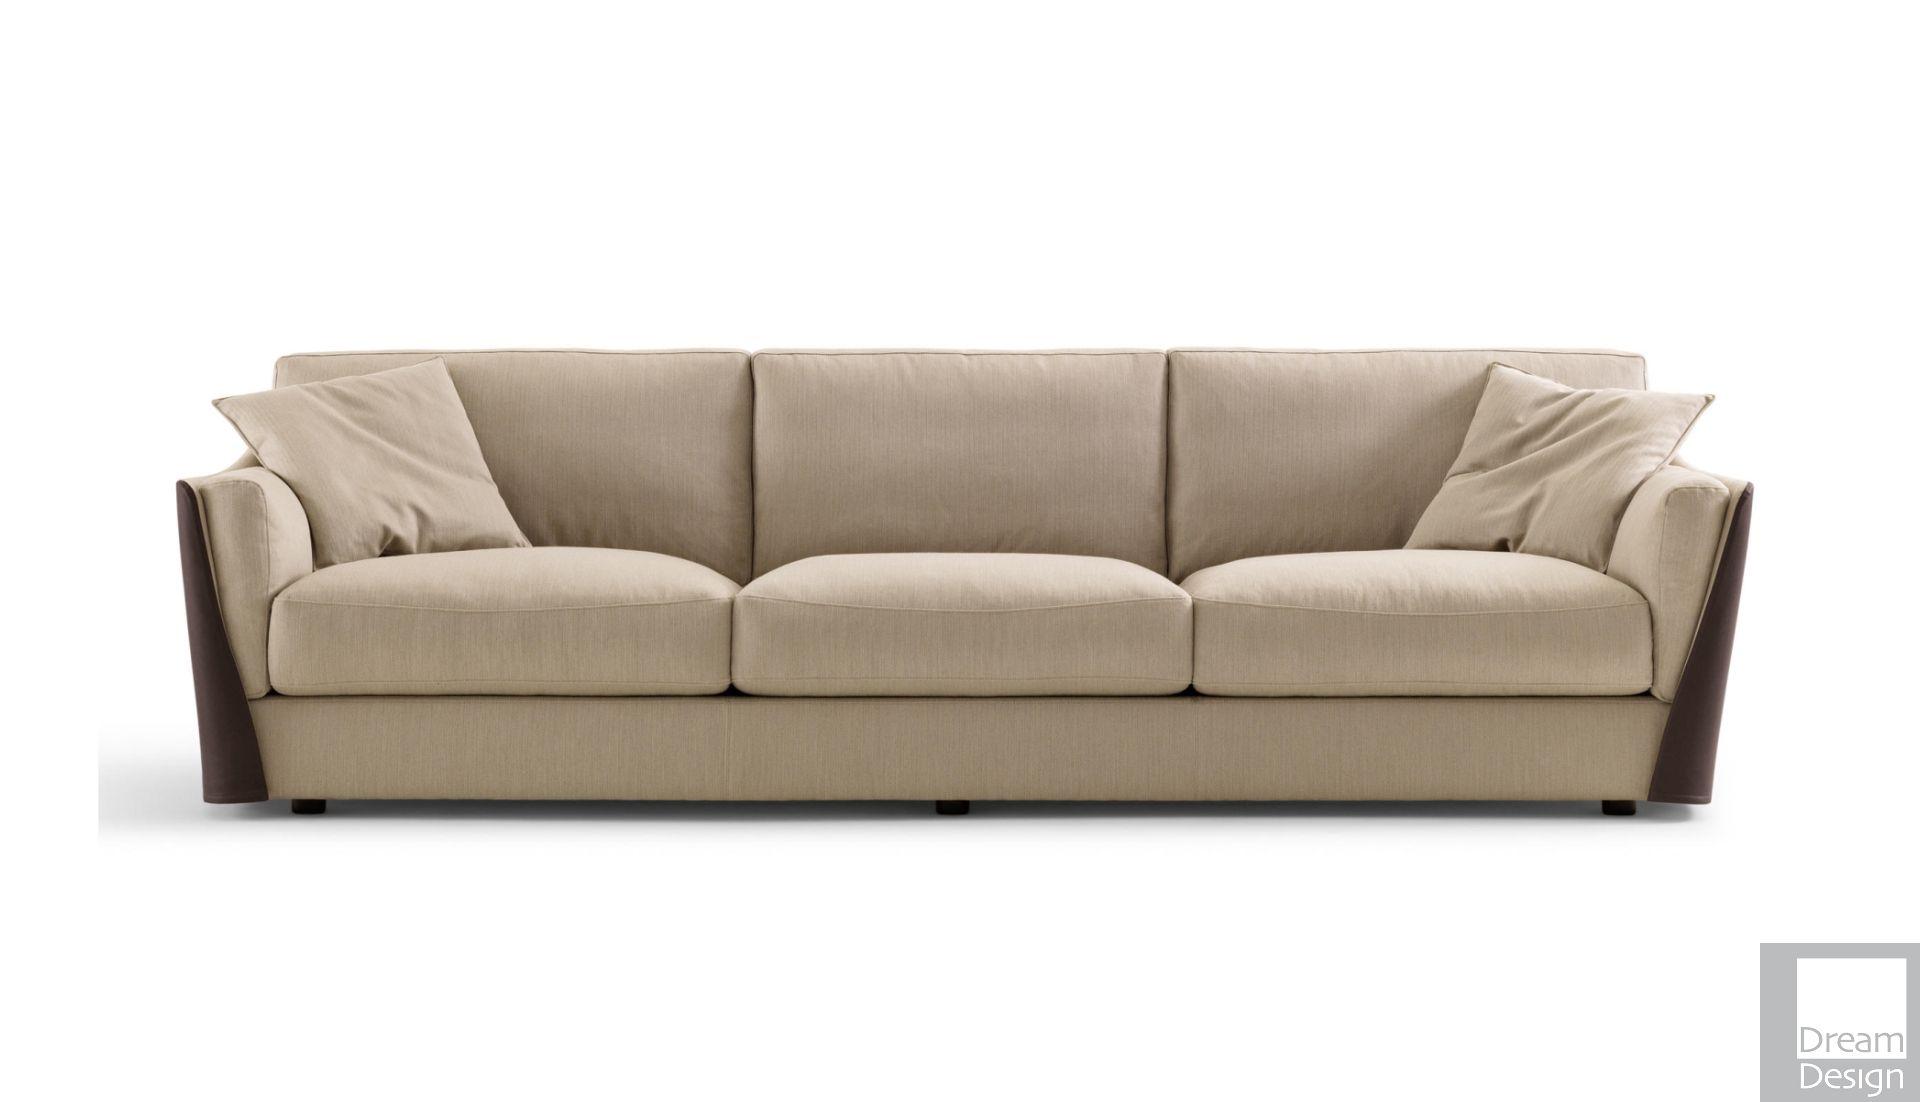 Furniture Design. by Cheo Mistry Luxury sofa, Sofa, Sofa